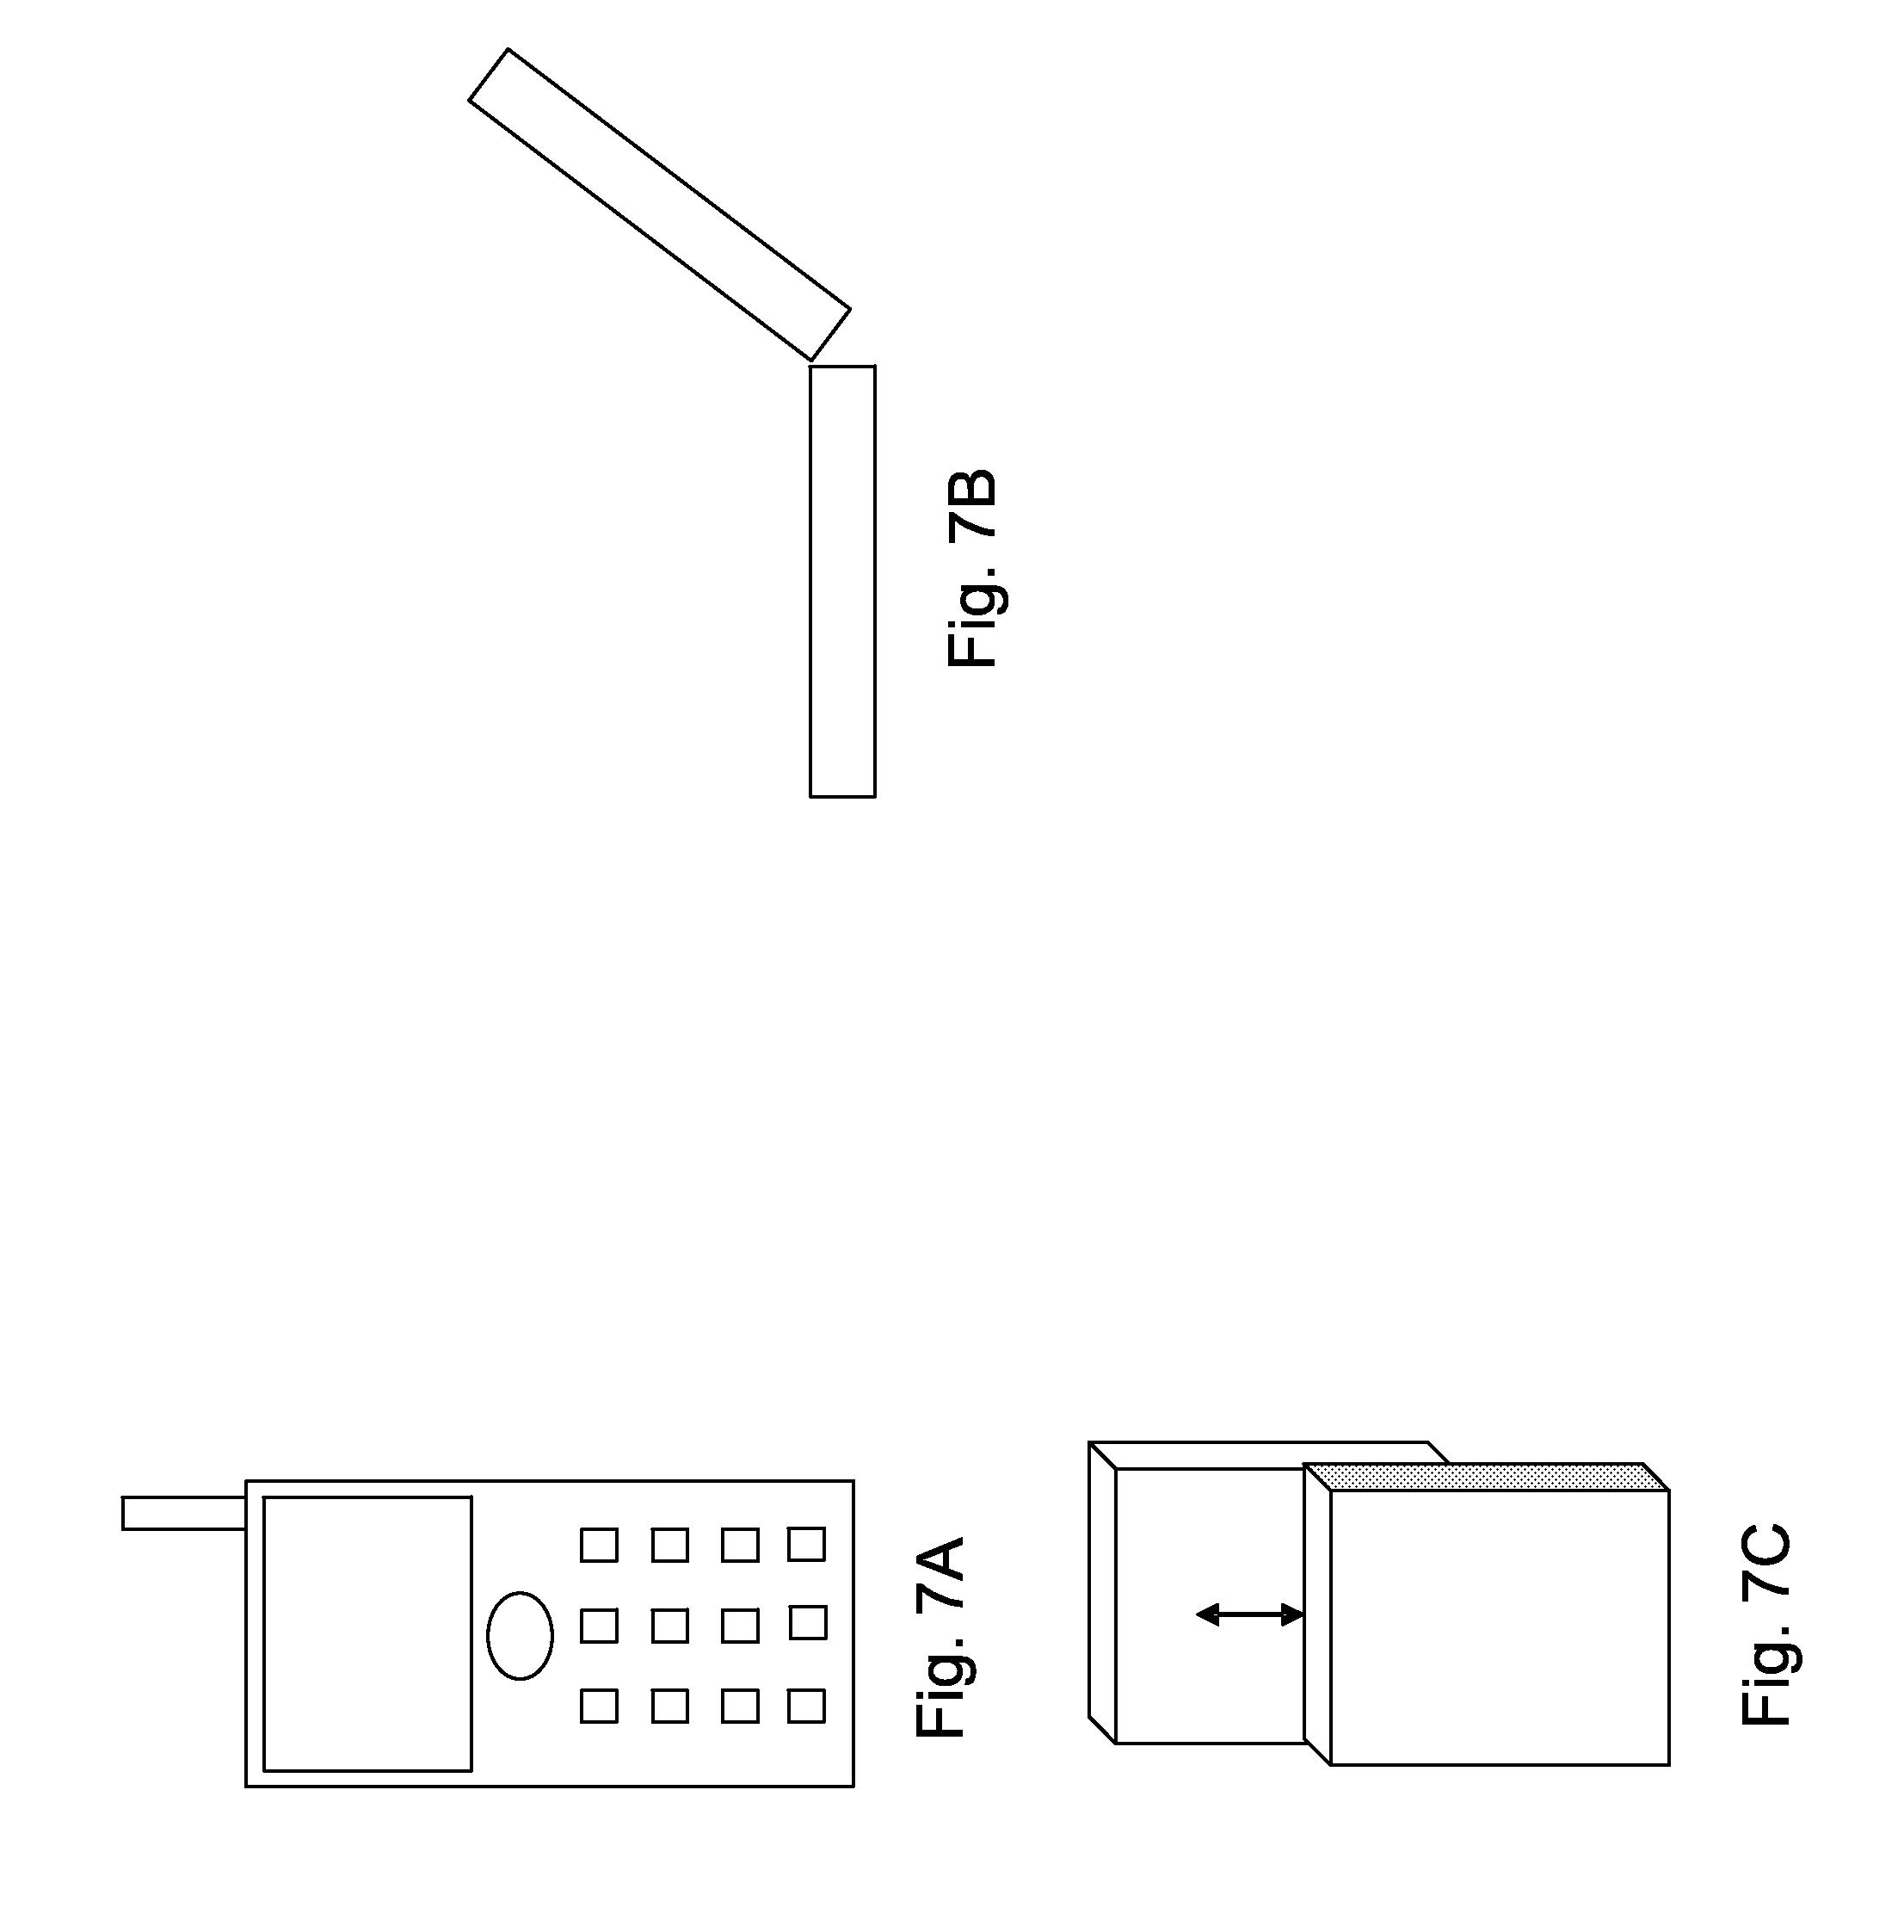 Patent US 9,471,925 B2